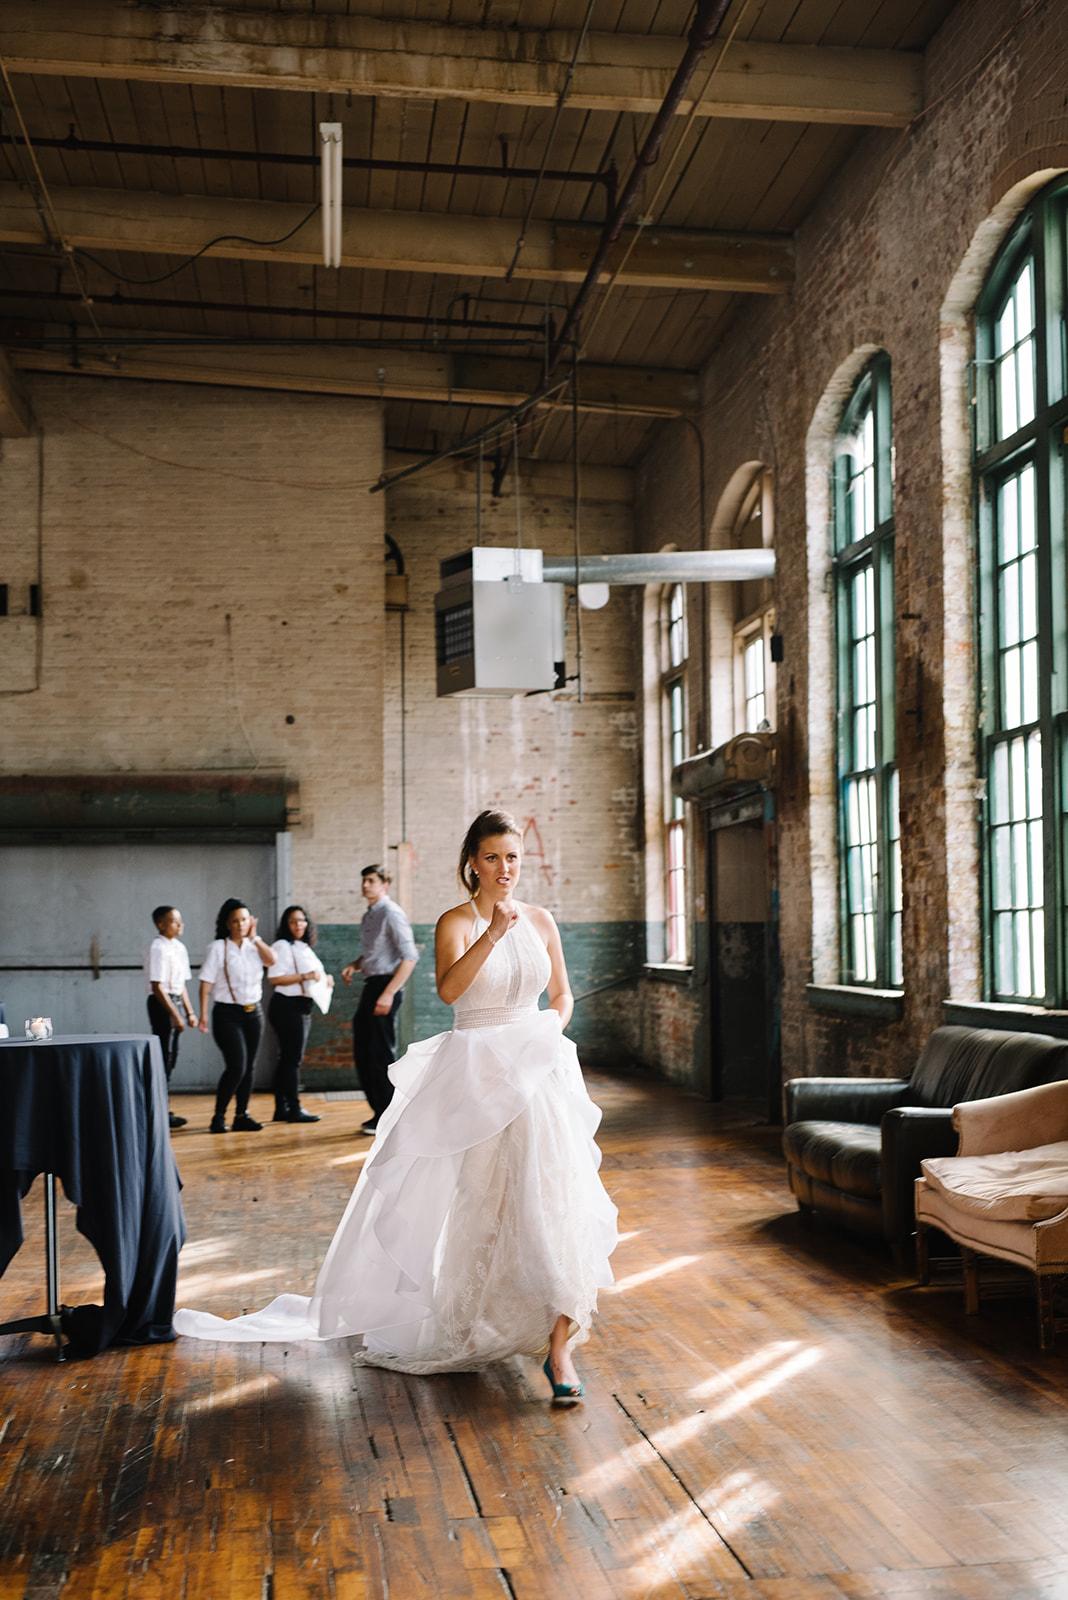 Art Factory Wedding- Industrial Chic- Audrey+Ryan- Paterson NJ- Olivia Christina Photo (41).jpg